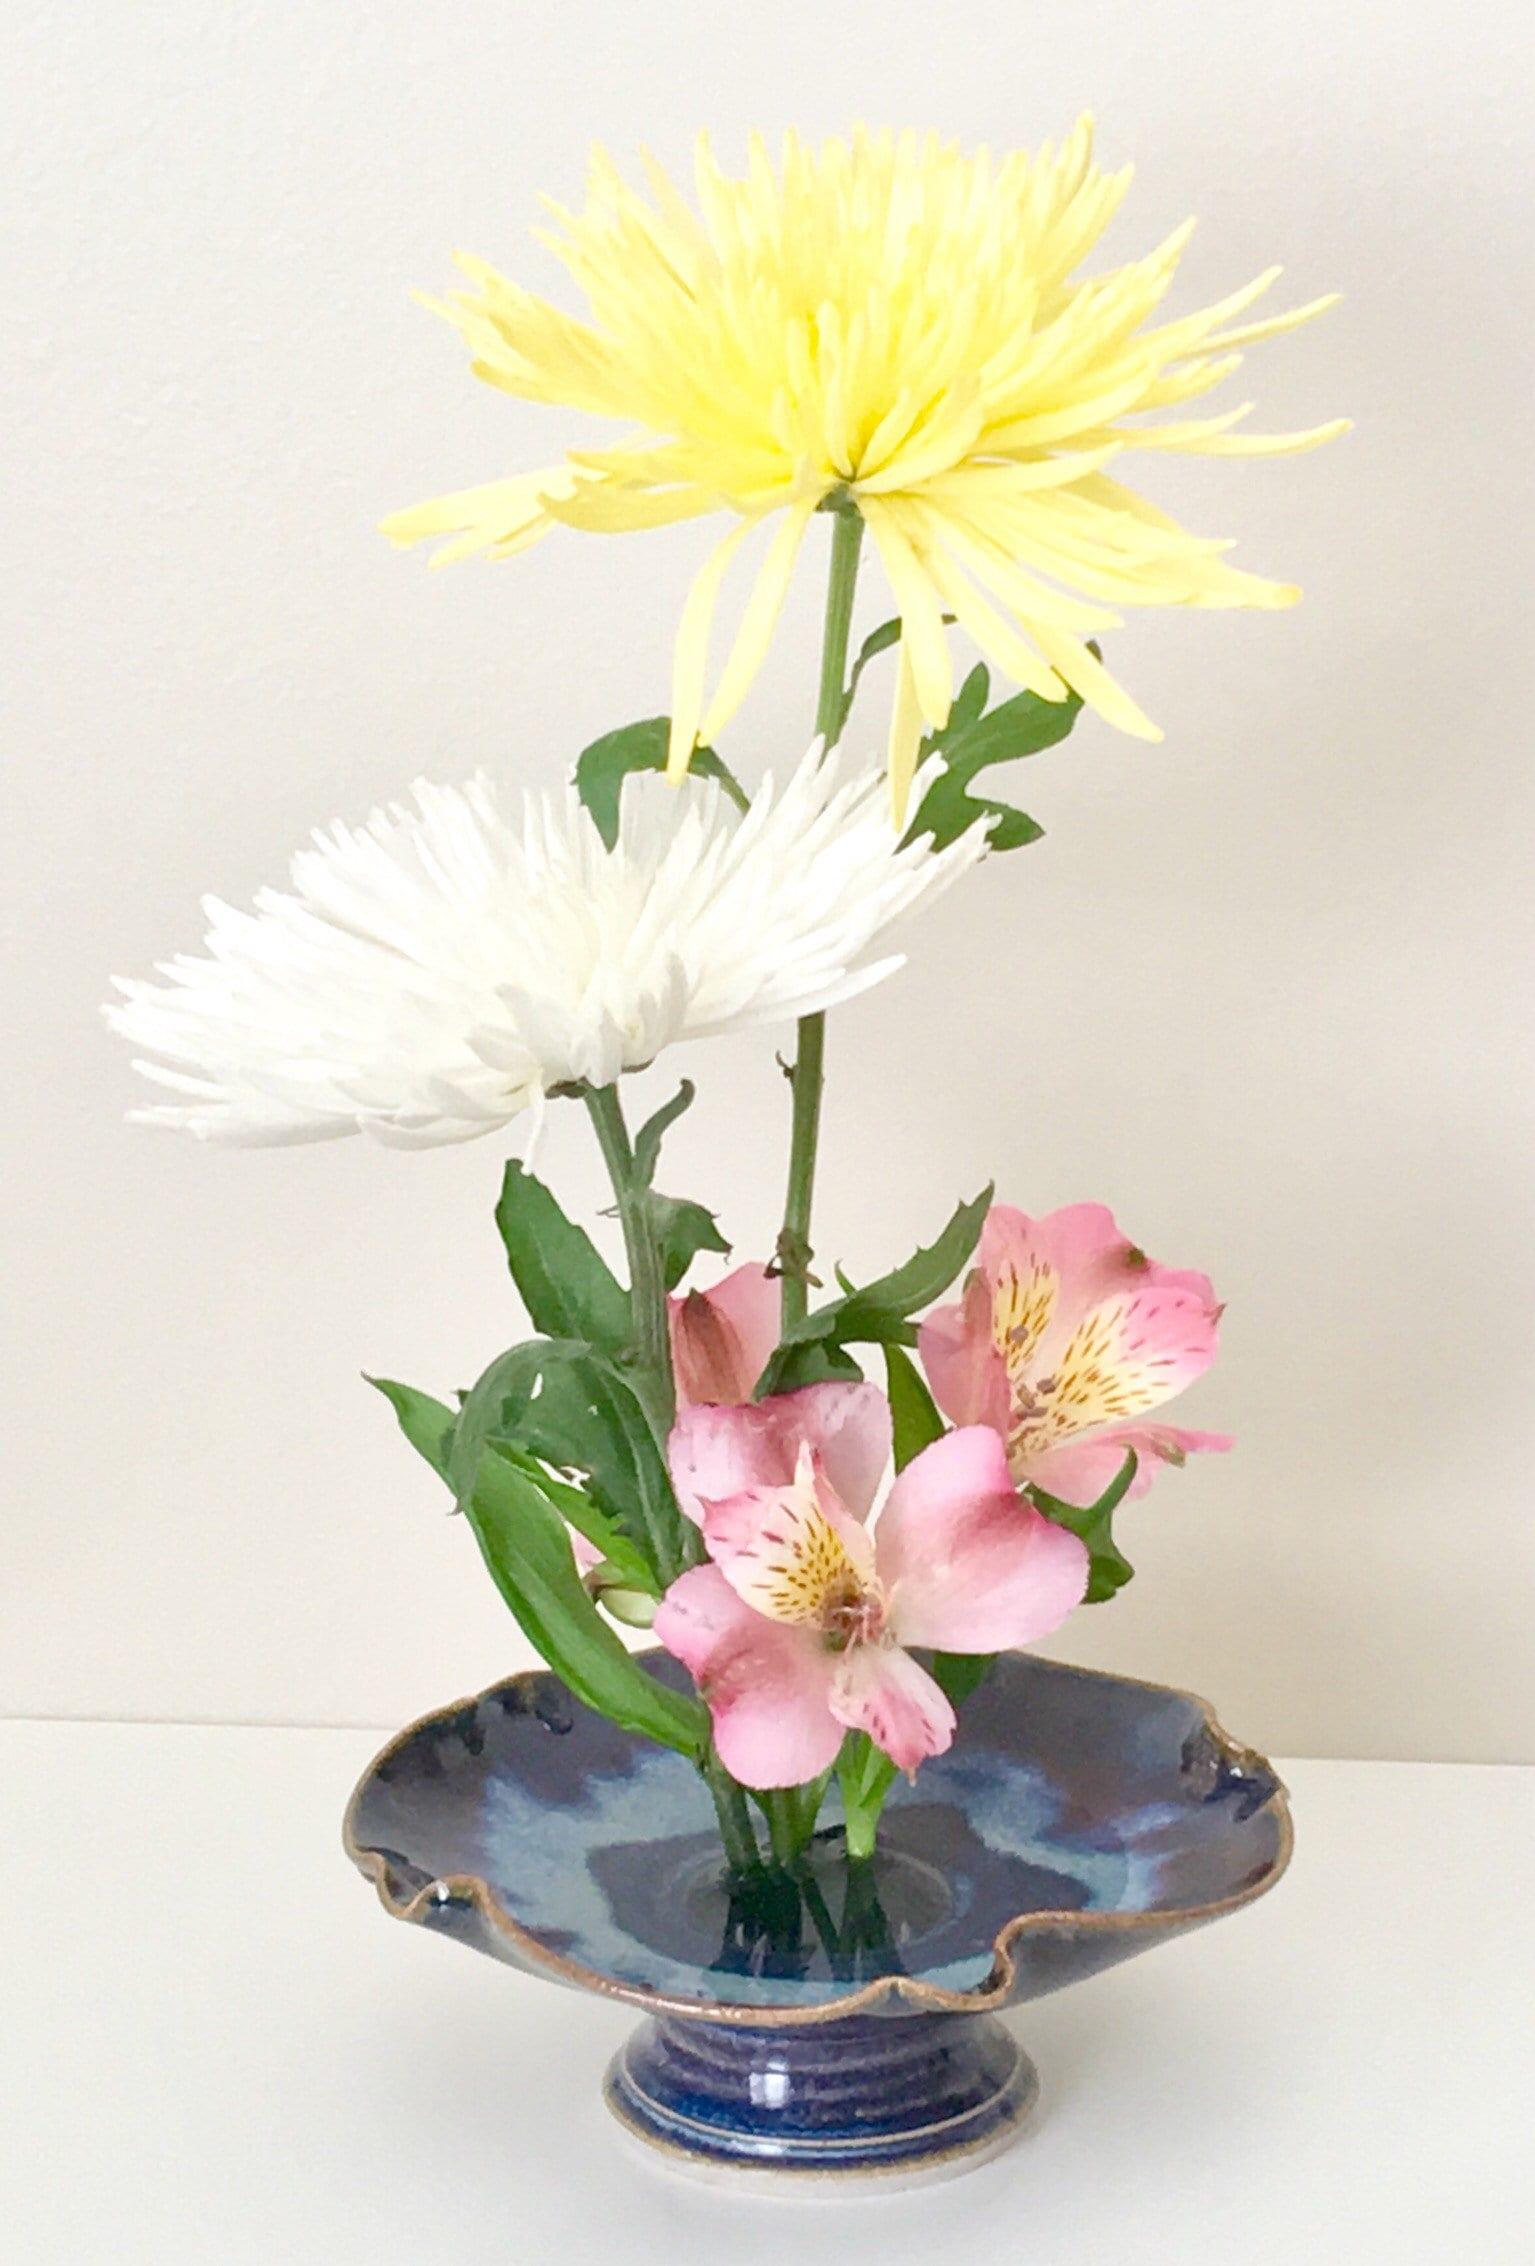 Ikebana With Pin Frog Japanese Style Flower Arranging Vase Centerpiece Porcelain Pottery Open Flower Bowl Vase With Floral Frog Kenzan